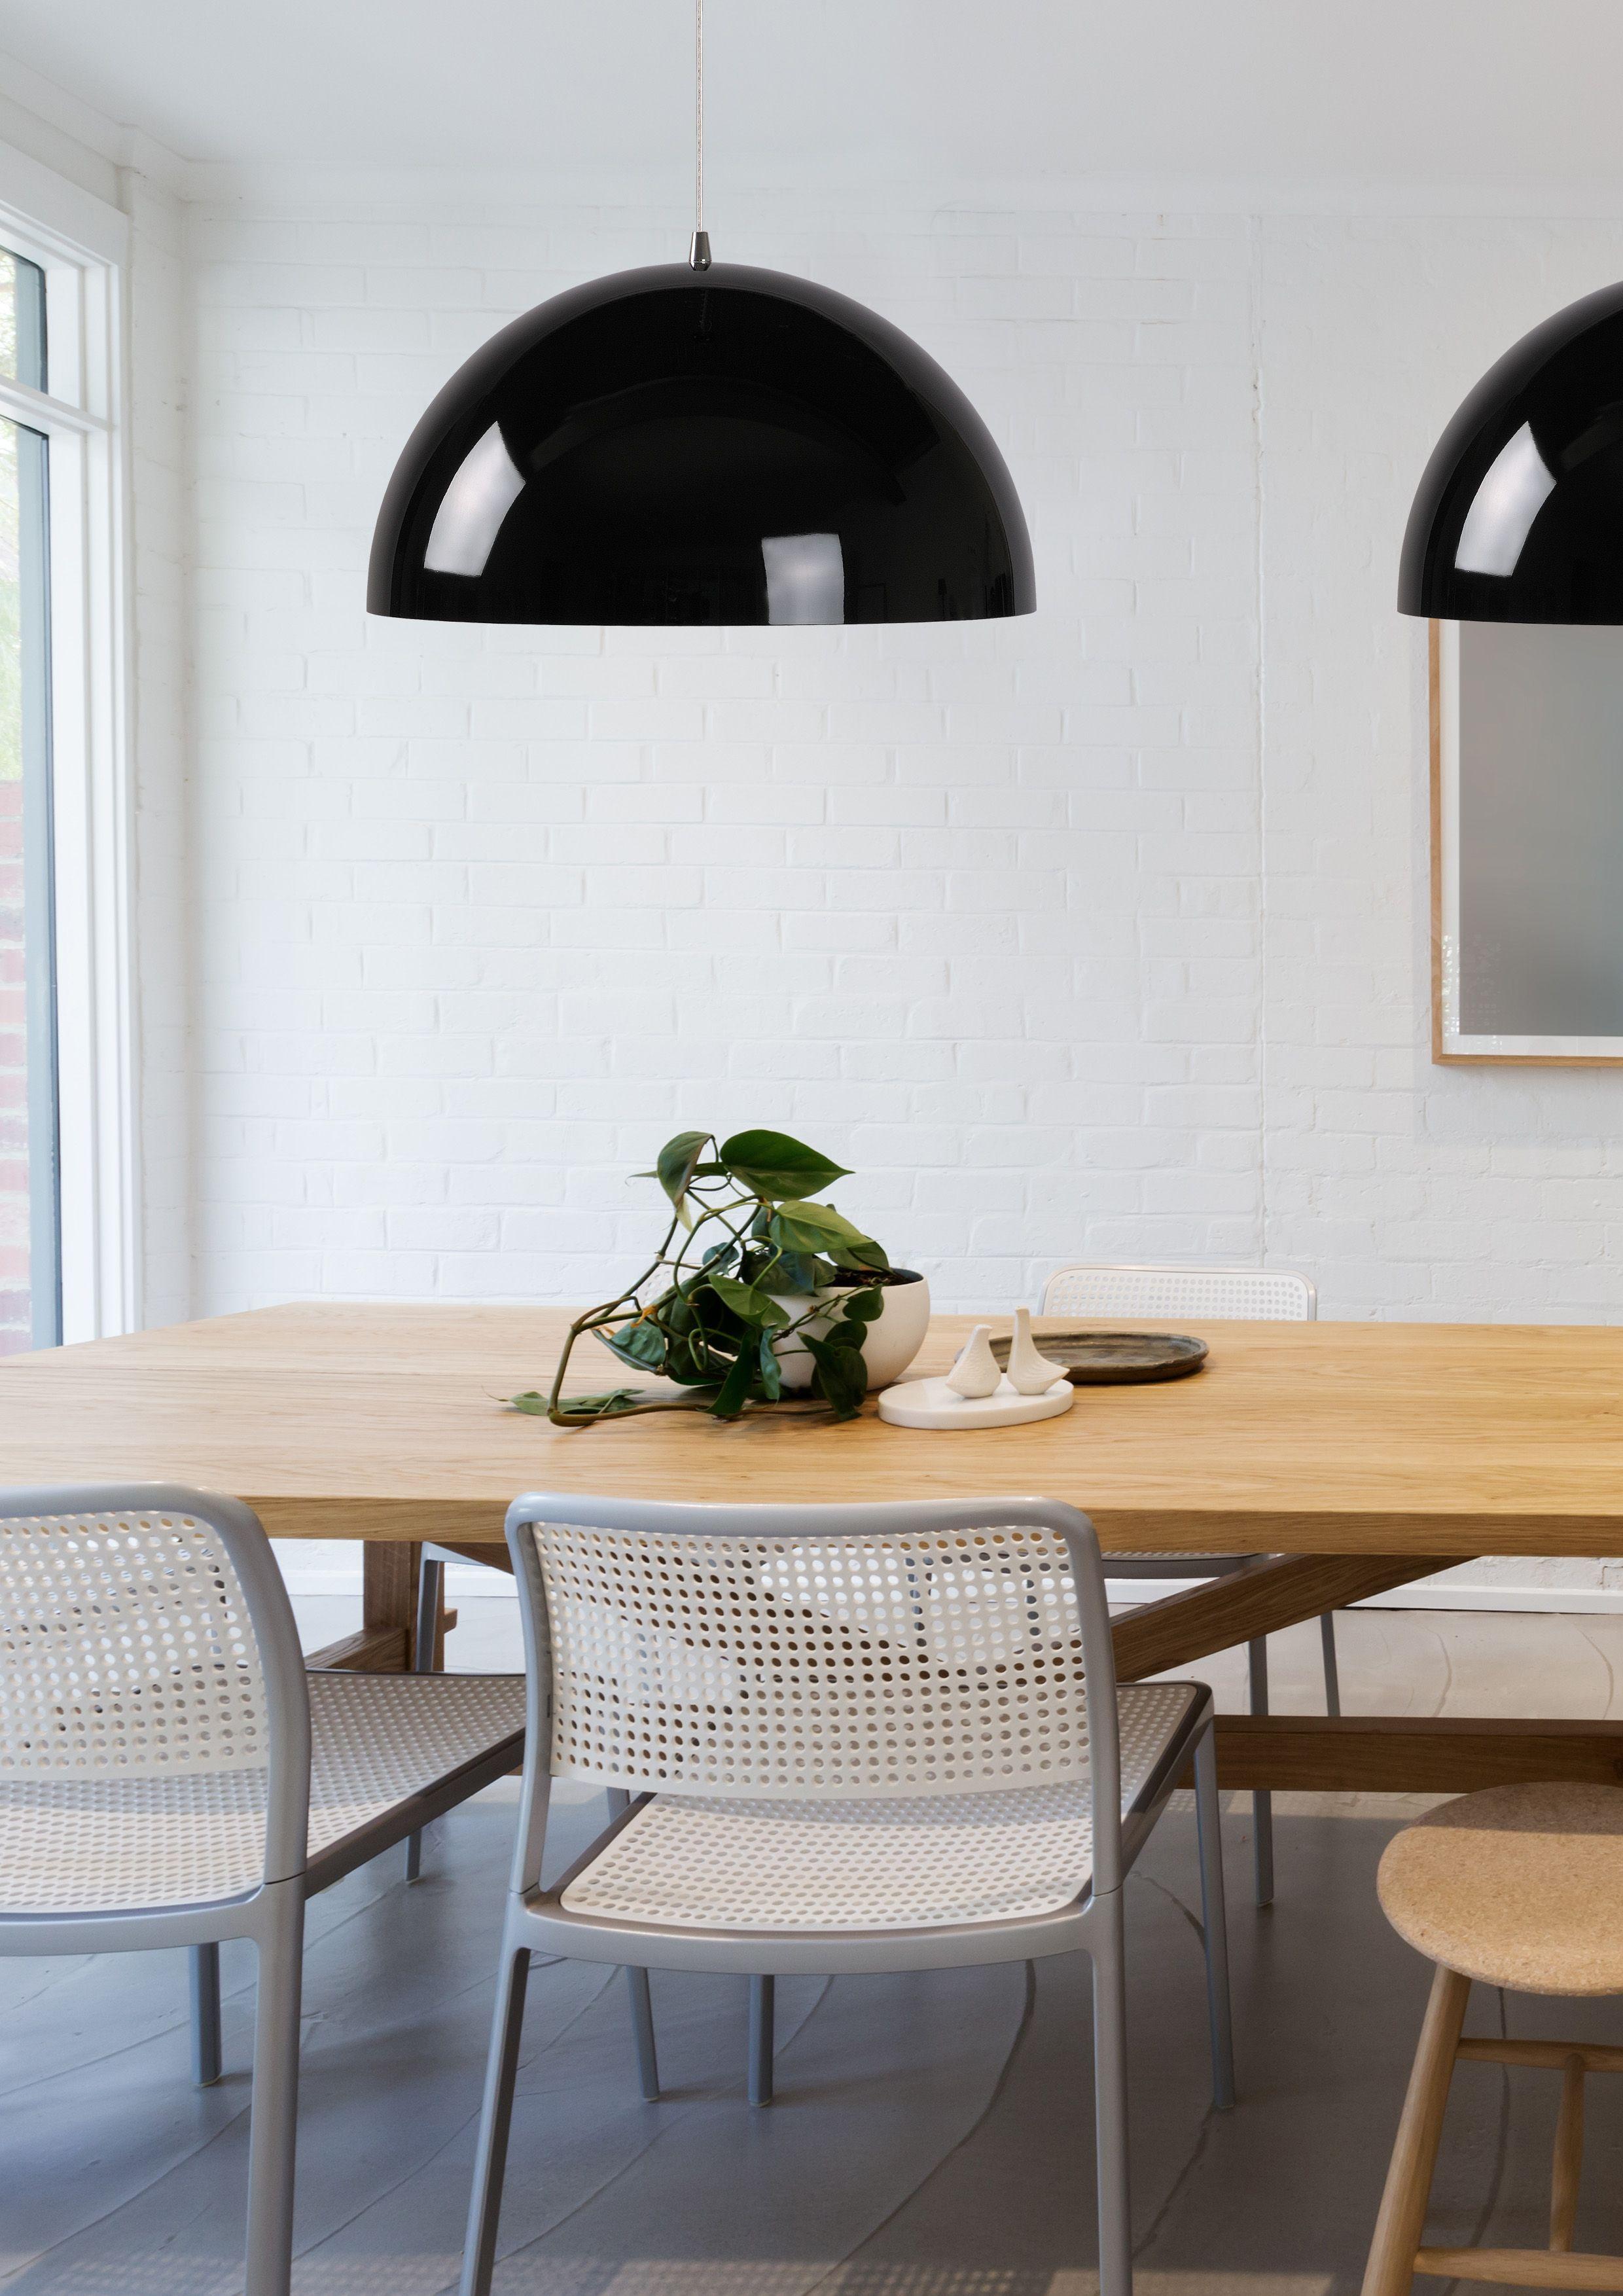 Zyrandol Riva 31410 50 30 Czarny 50 Cm Lucide Home Decor Dining Table Decor